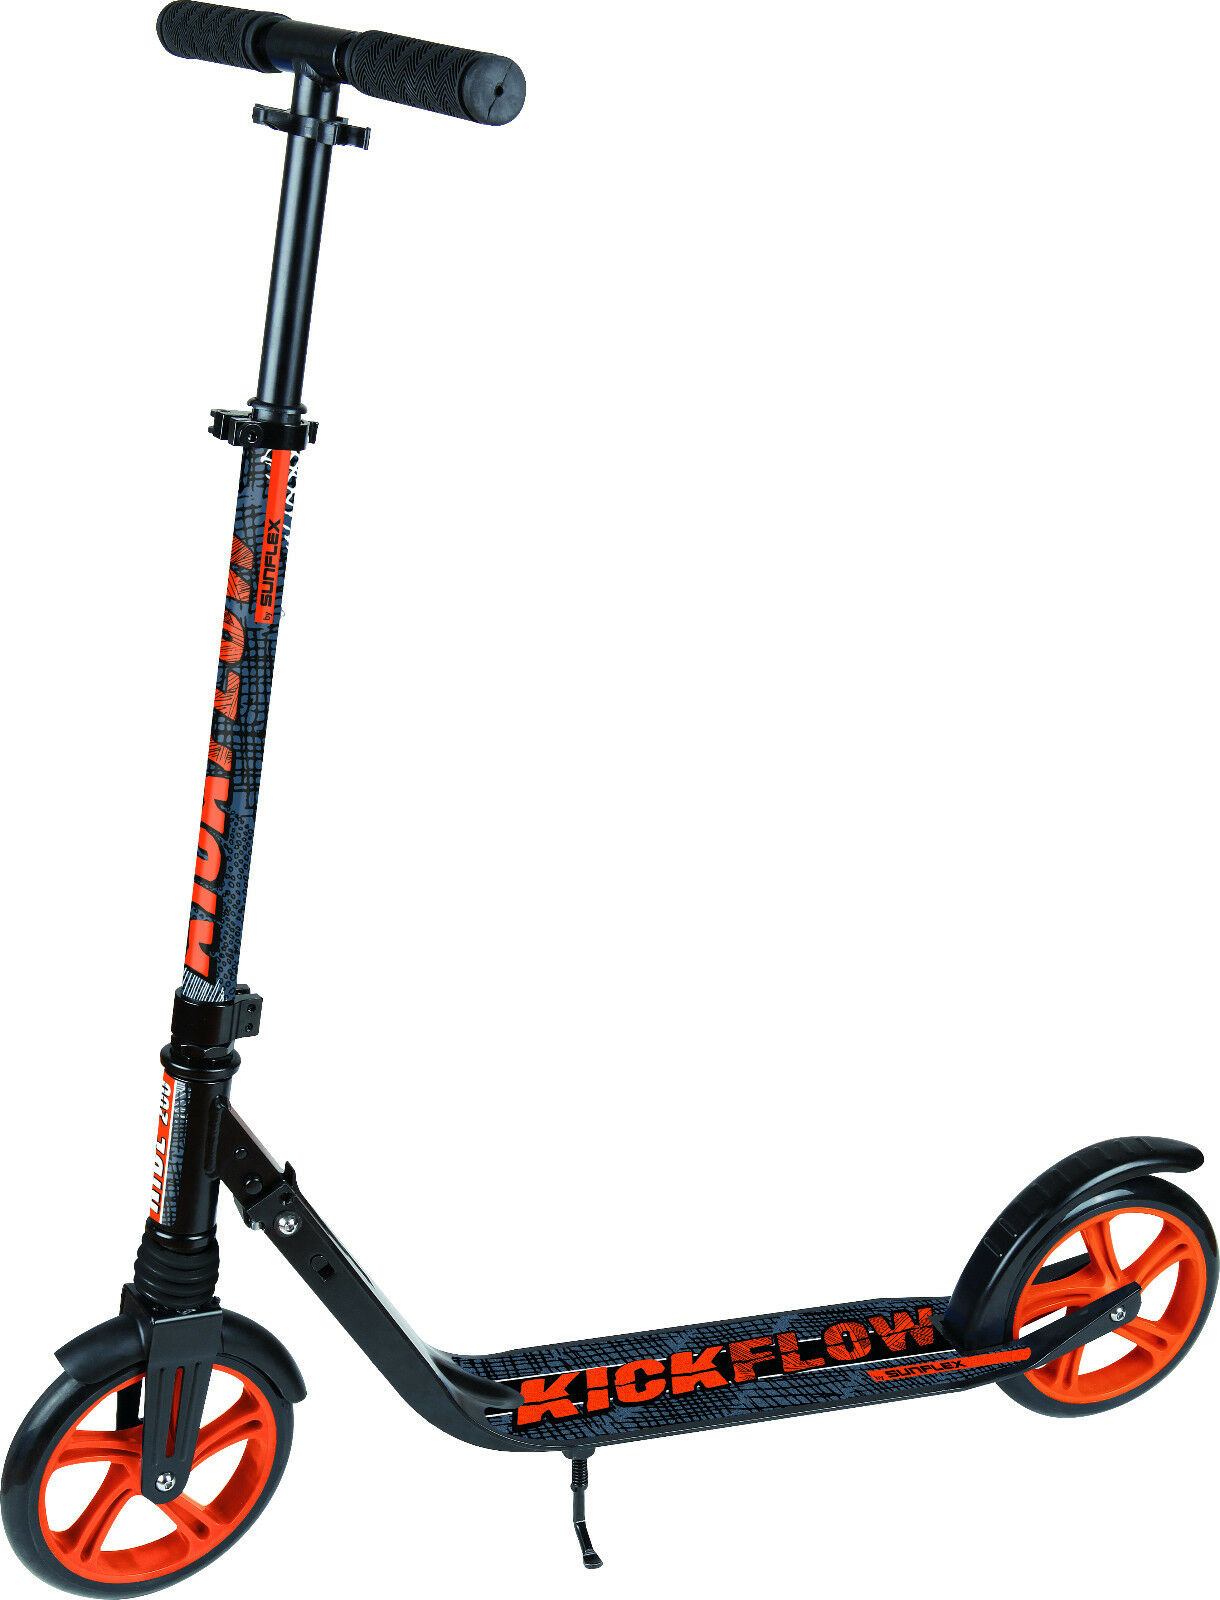 Kickflow Scooter Patinete Scooter Naranja Plegable a partir de 8 Años